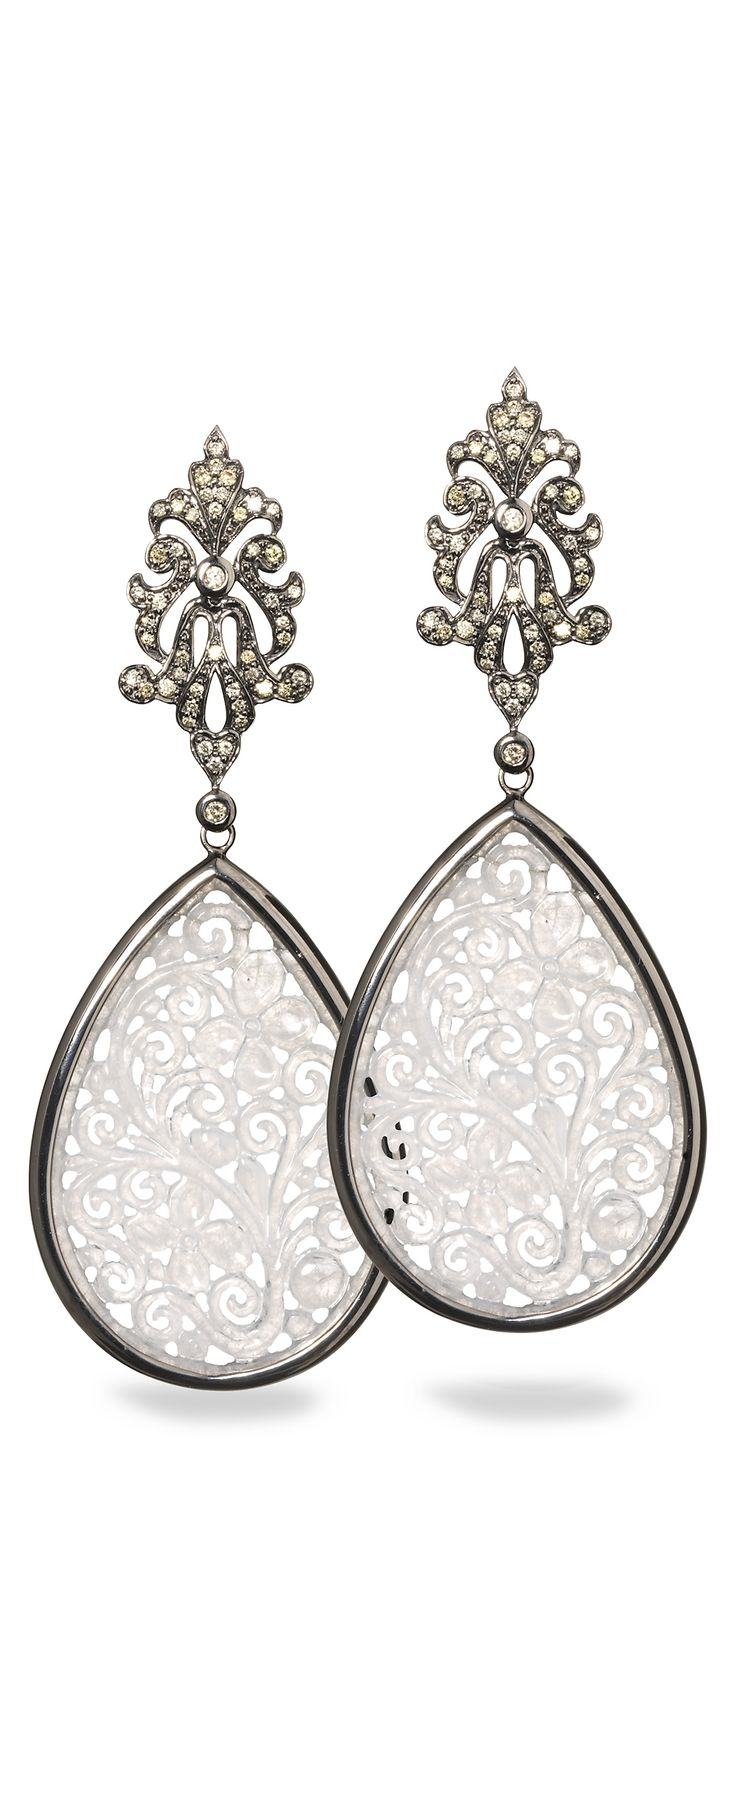 Bochic Earrings to Be Displayed at Harvey Nichols Riyadh